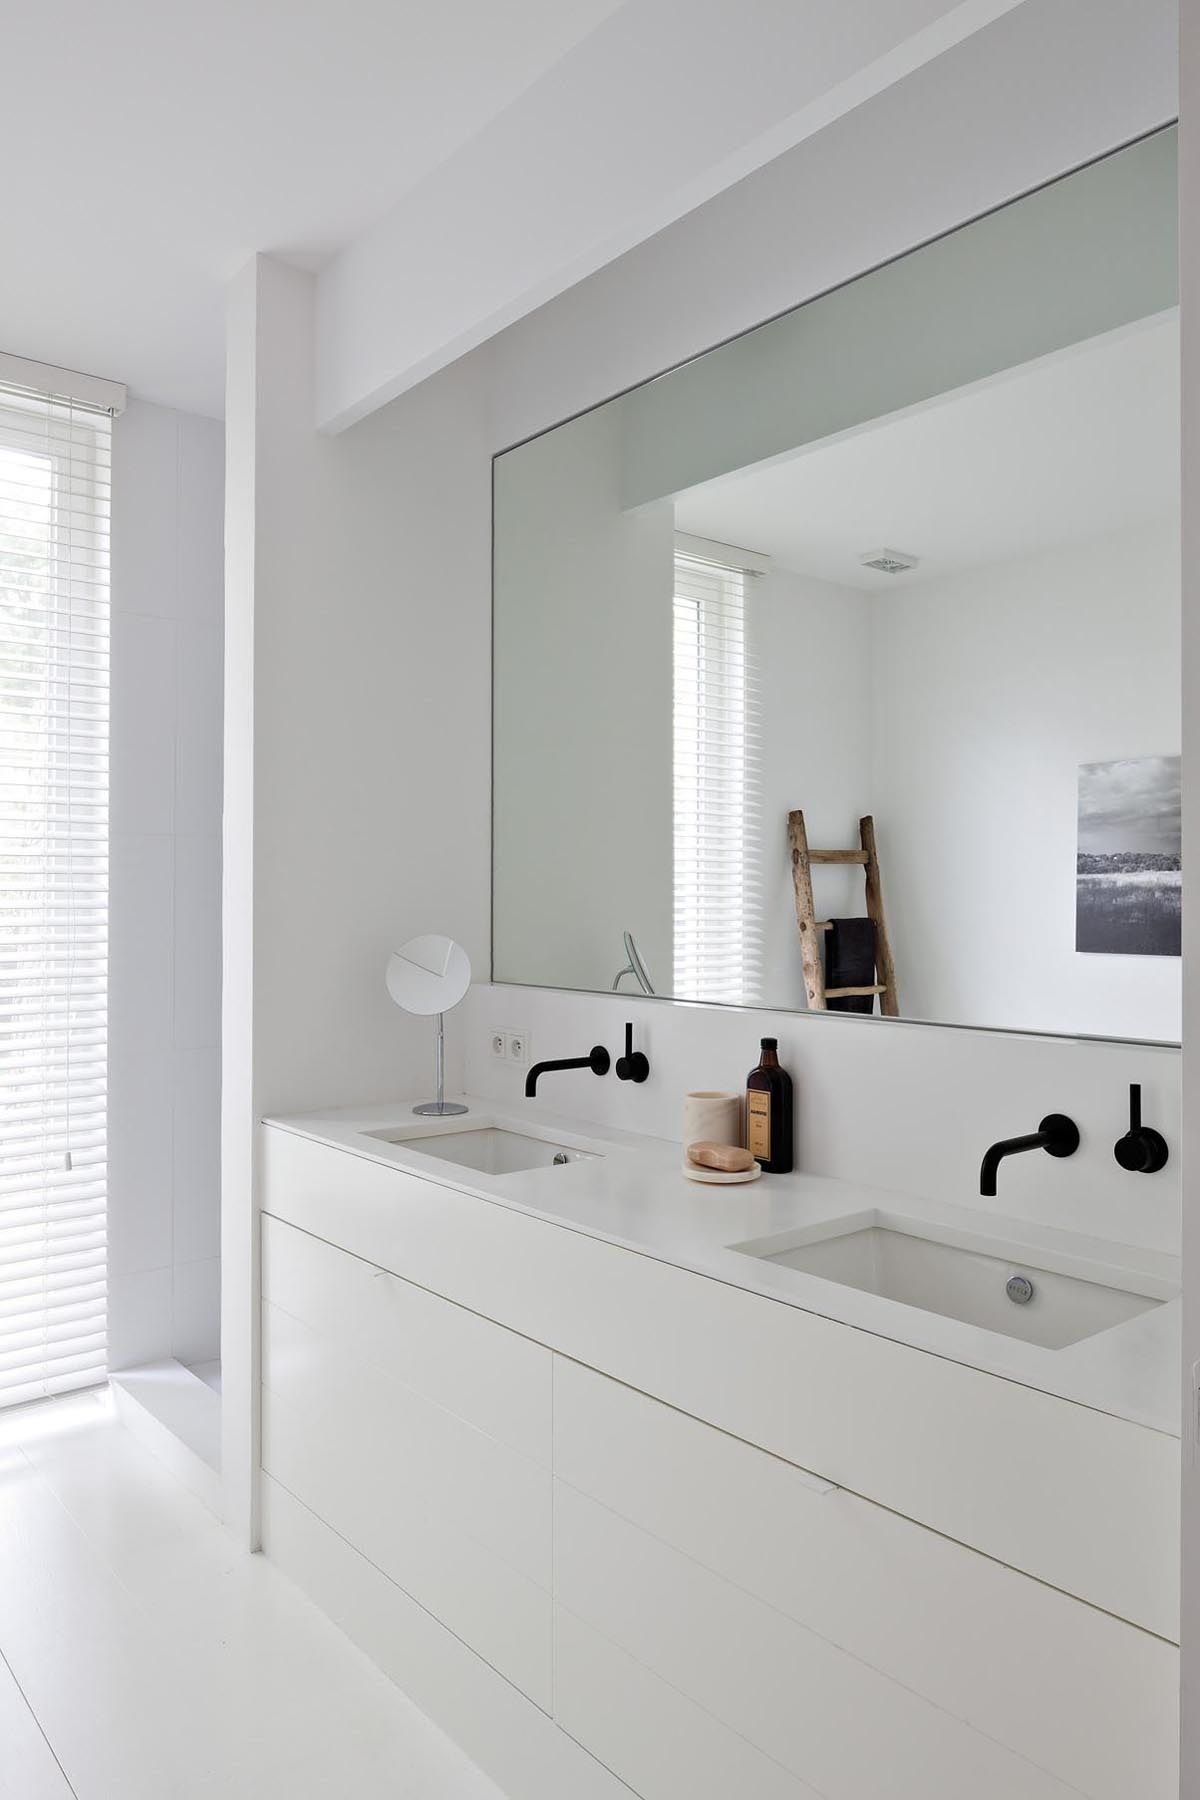 badkarmer | inspiraatio | Pinterest | Bathroom inspiration ...